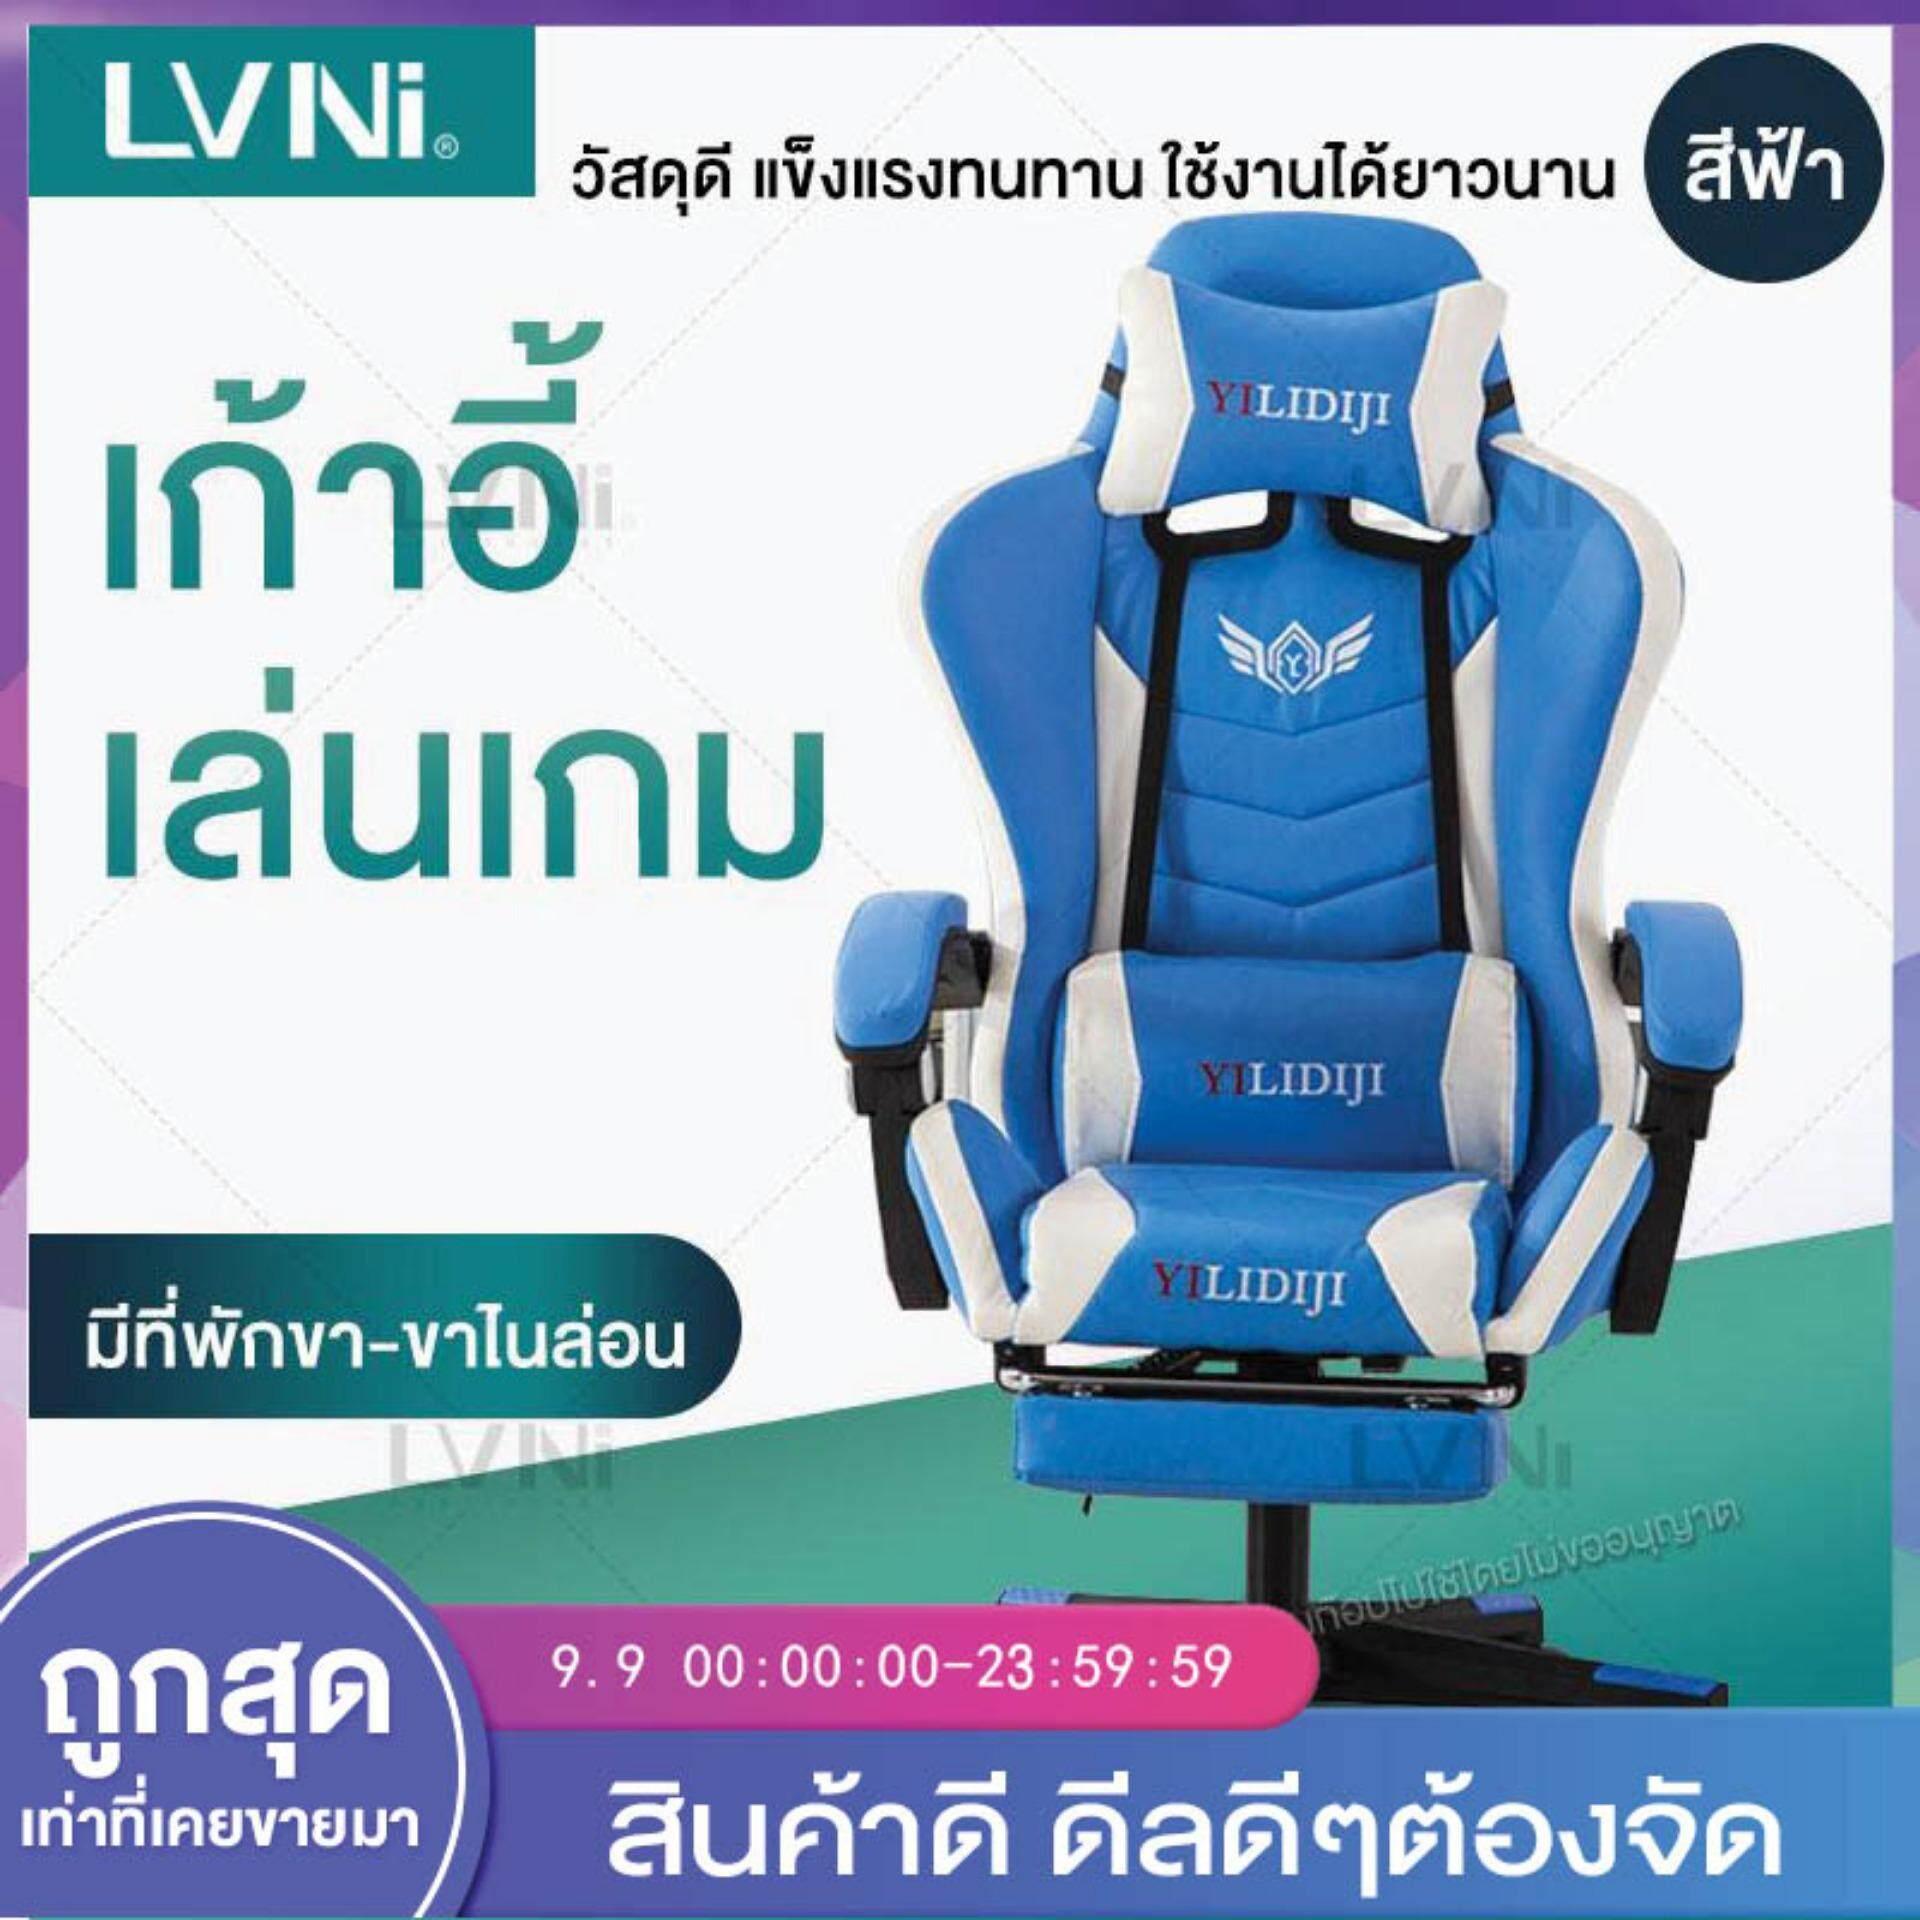 LVNI เก้าอี้เล่นเกม เก้าอี้เกมมิ่ง ปรับความสูงได้ มีที่นวดในตัว Gaming Chair รุ่น HM50